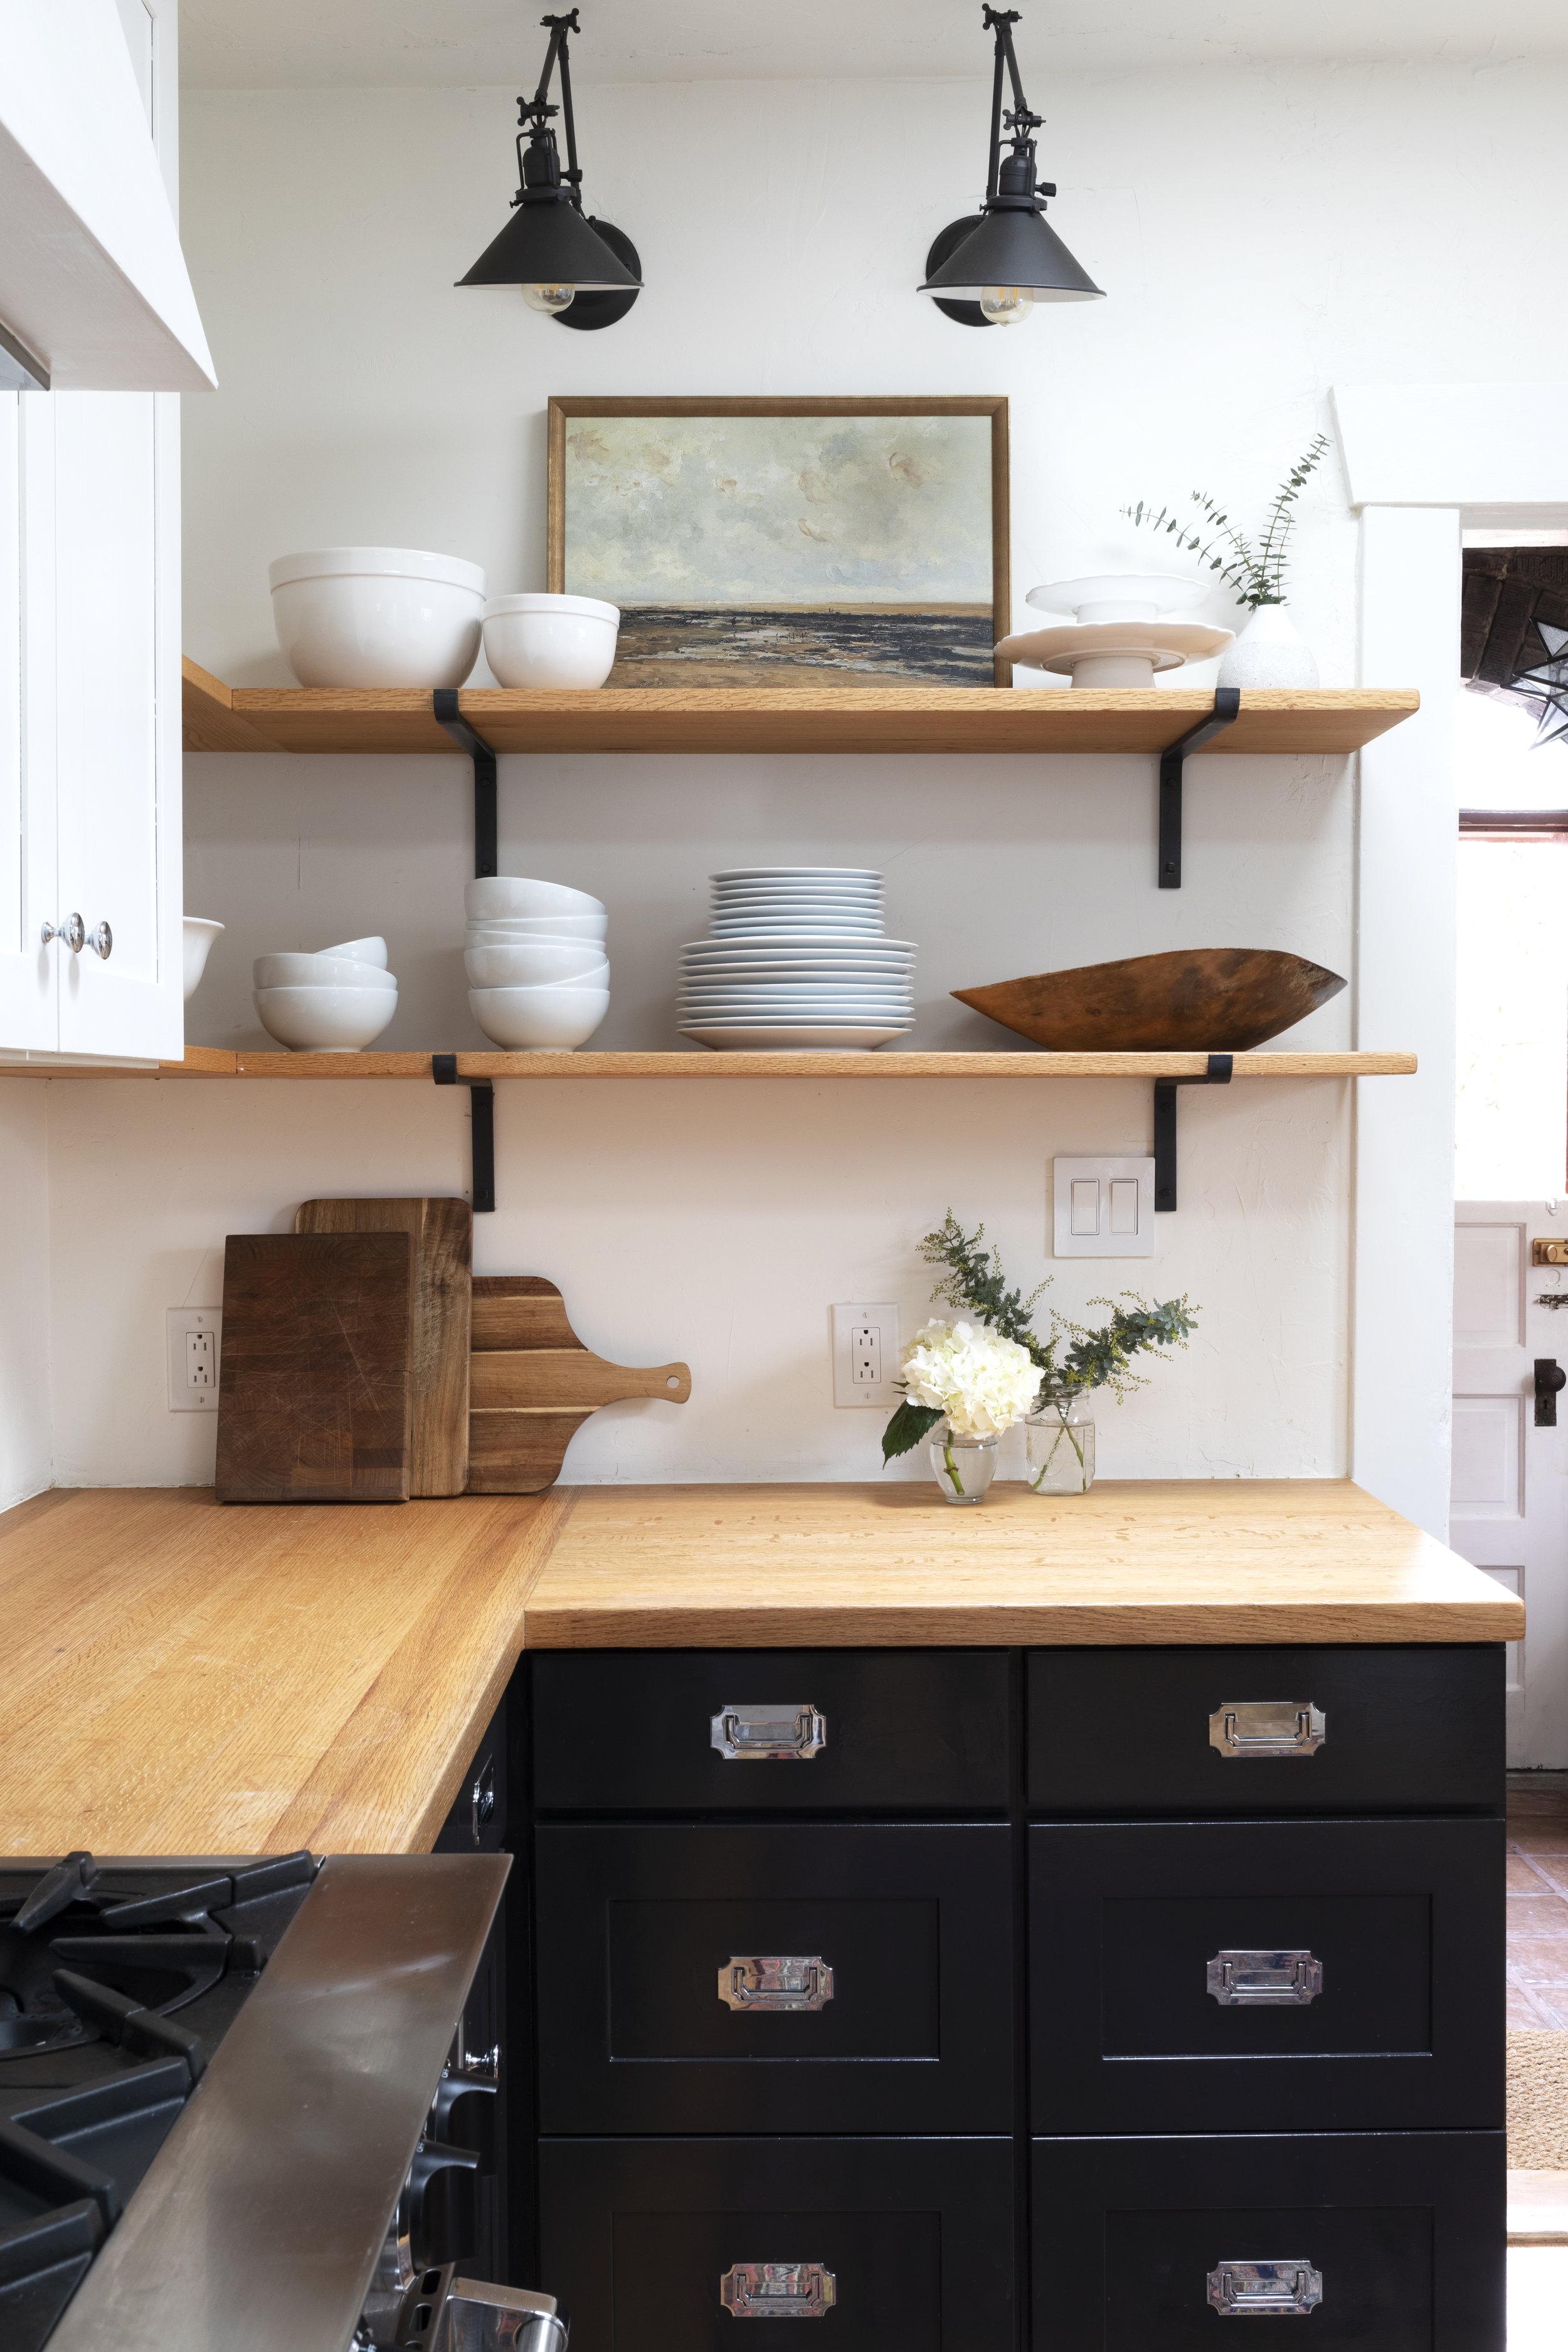 Red Oak Counters, Shelves, Floors